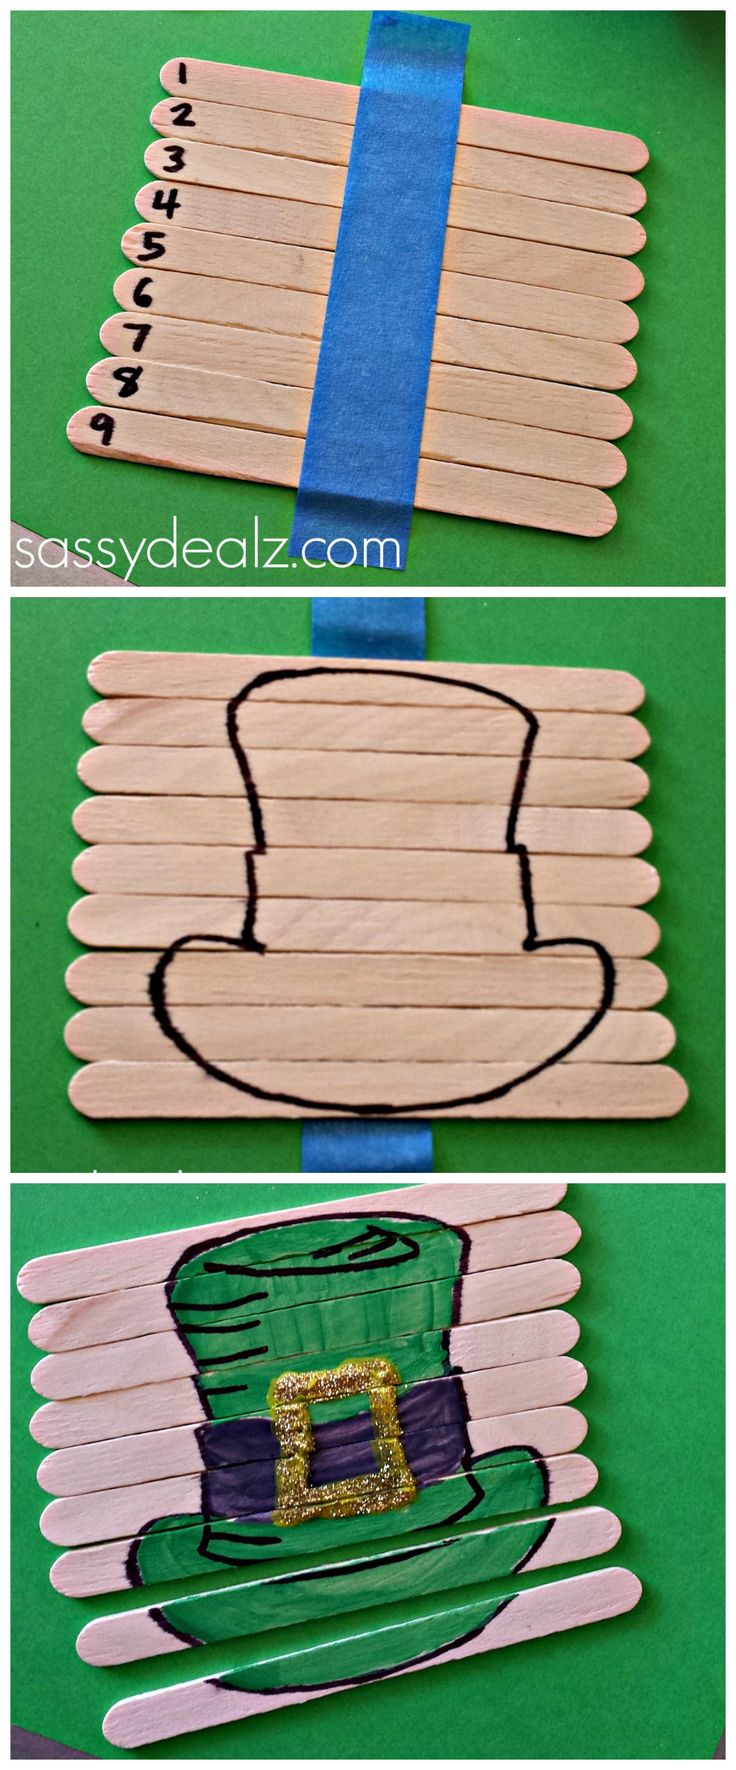 Leprechaun Hat Popsicle Stick Puzzle for St Patricks Day! #Kids activity #DIY   CraftyMorning.com